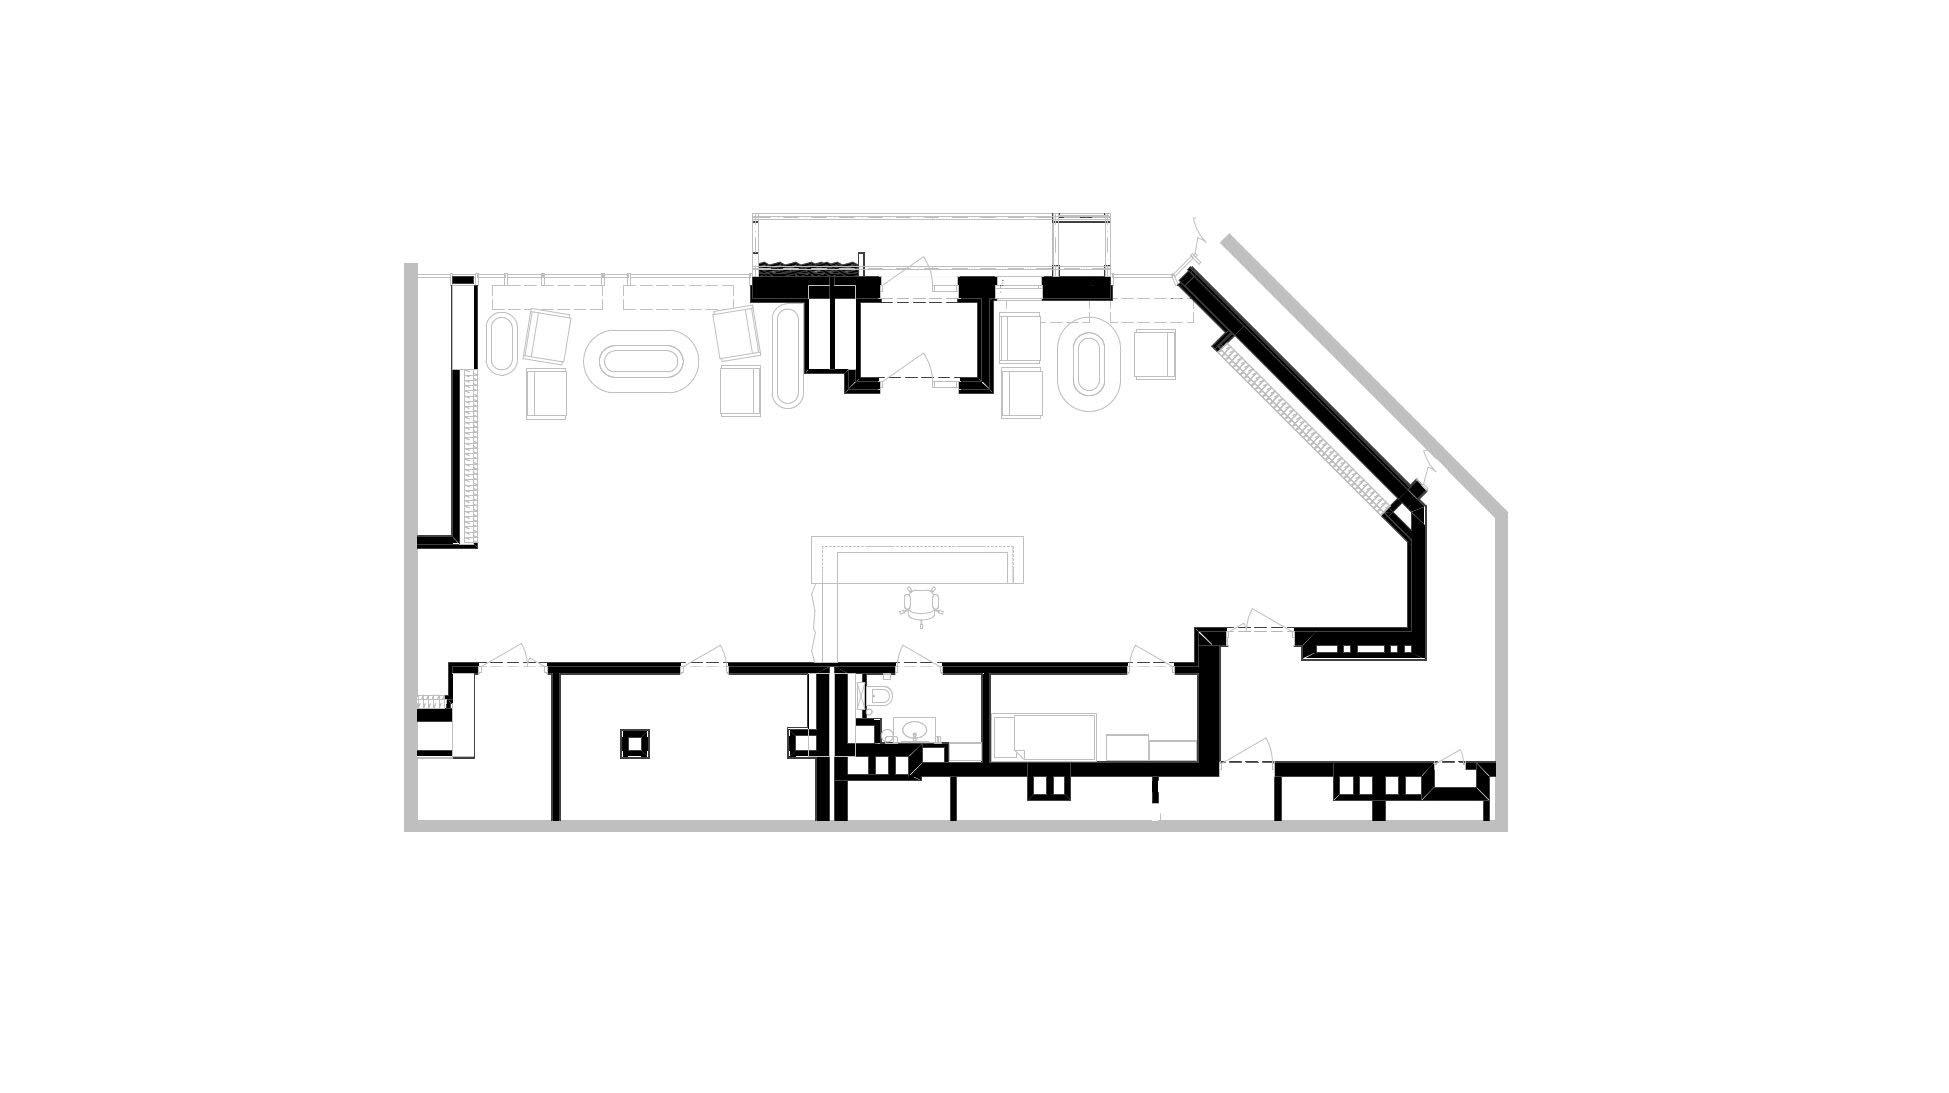 image-1-0: viiskovyi_proizd-interior